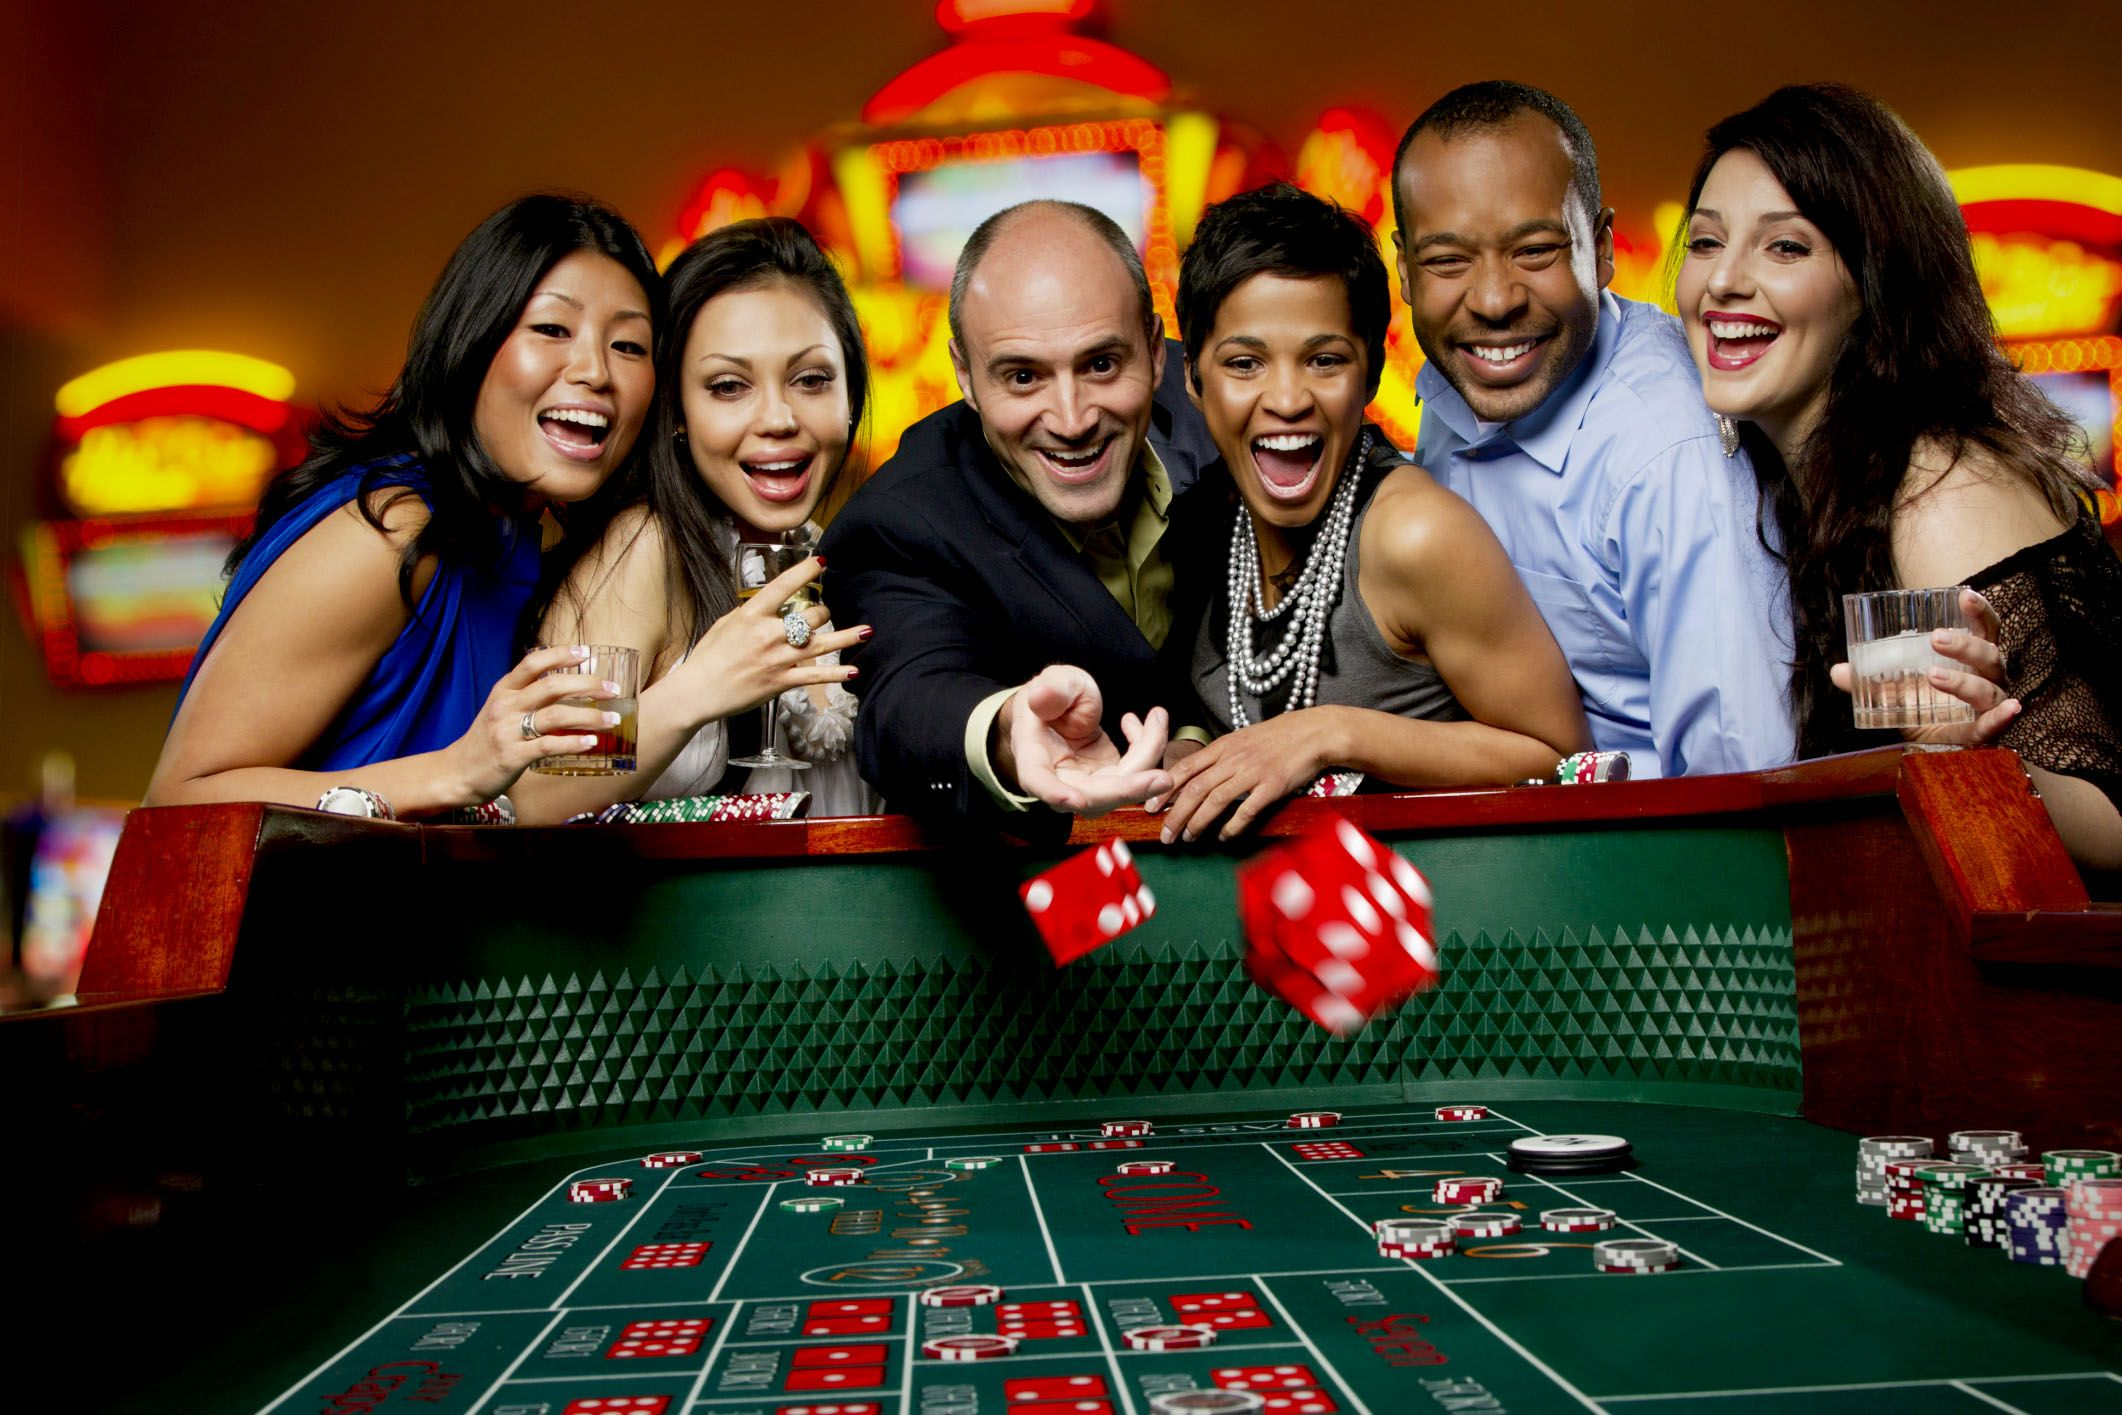 Casino tours in Slovenia